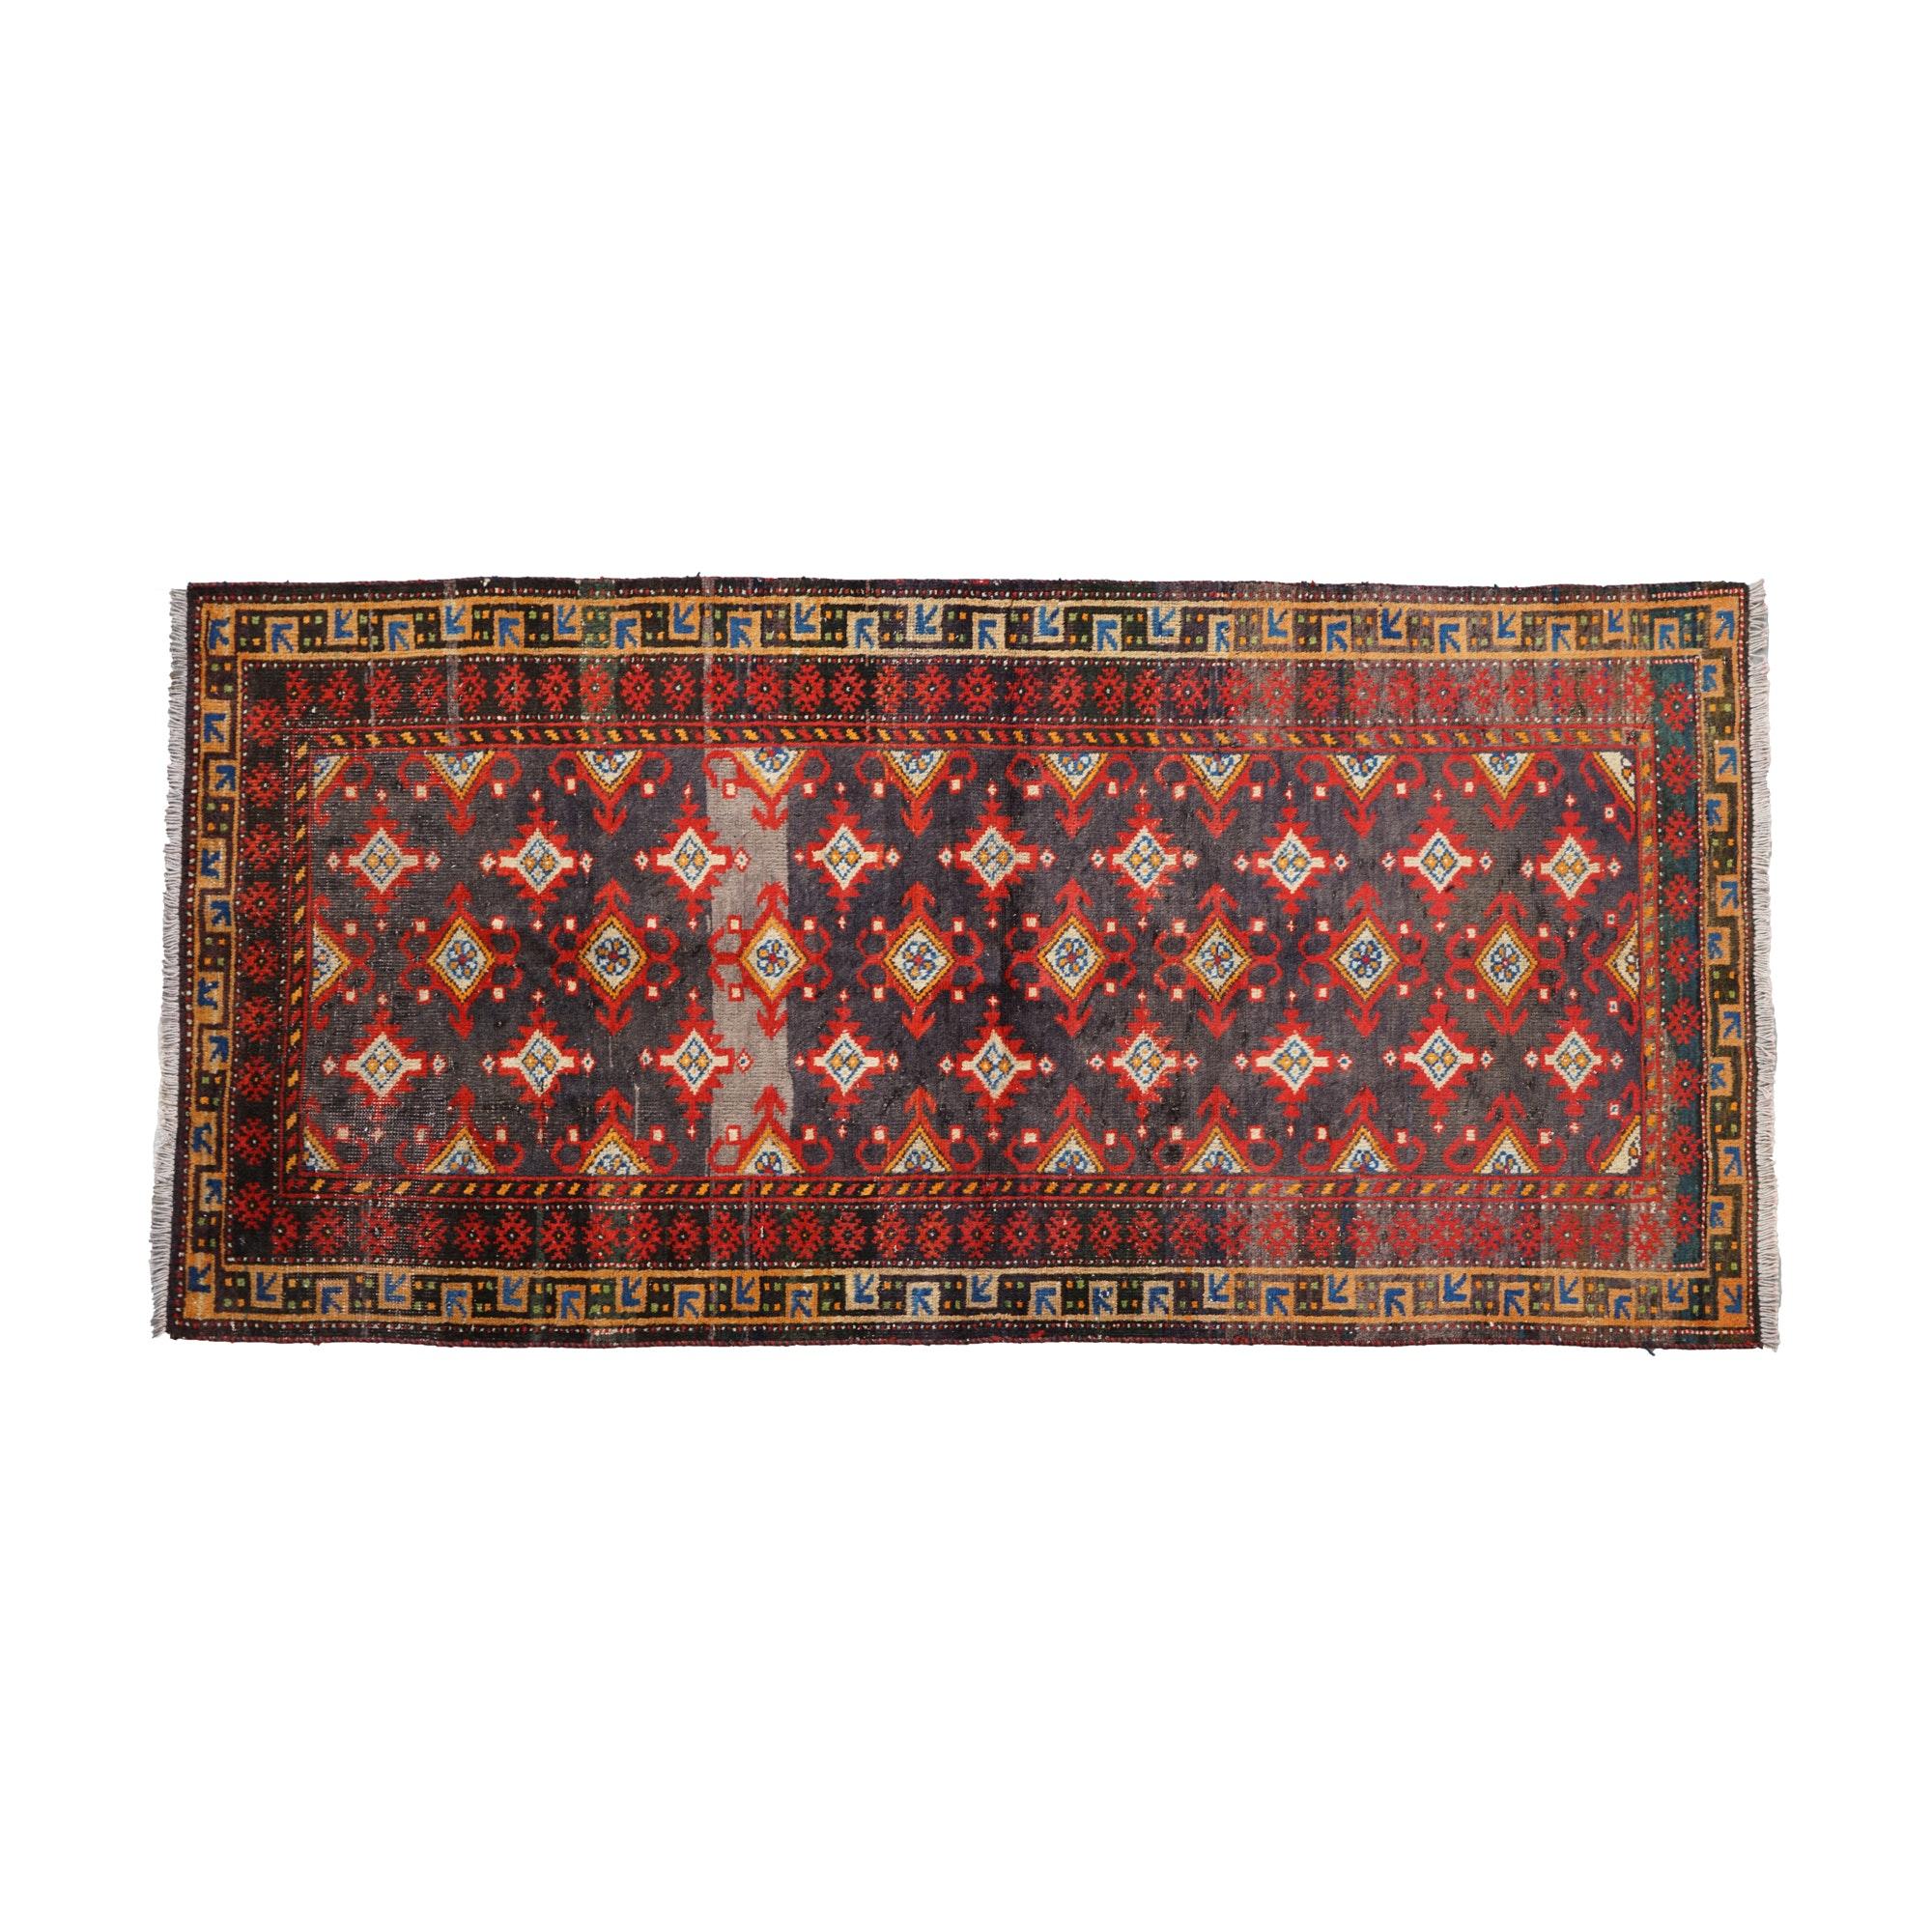 Hand-Knotted Anatolian Wool Area Rug